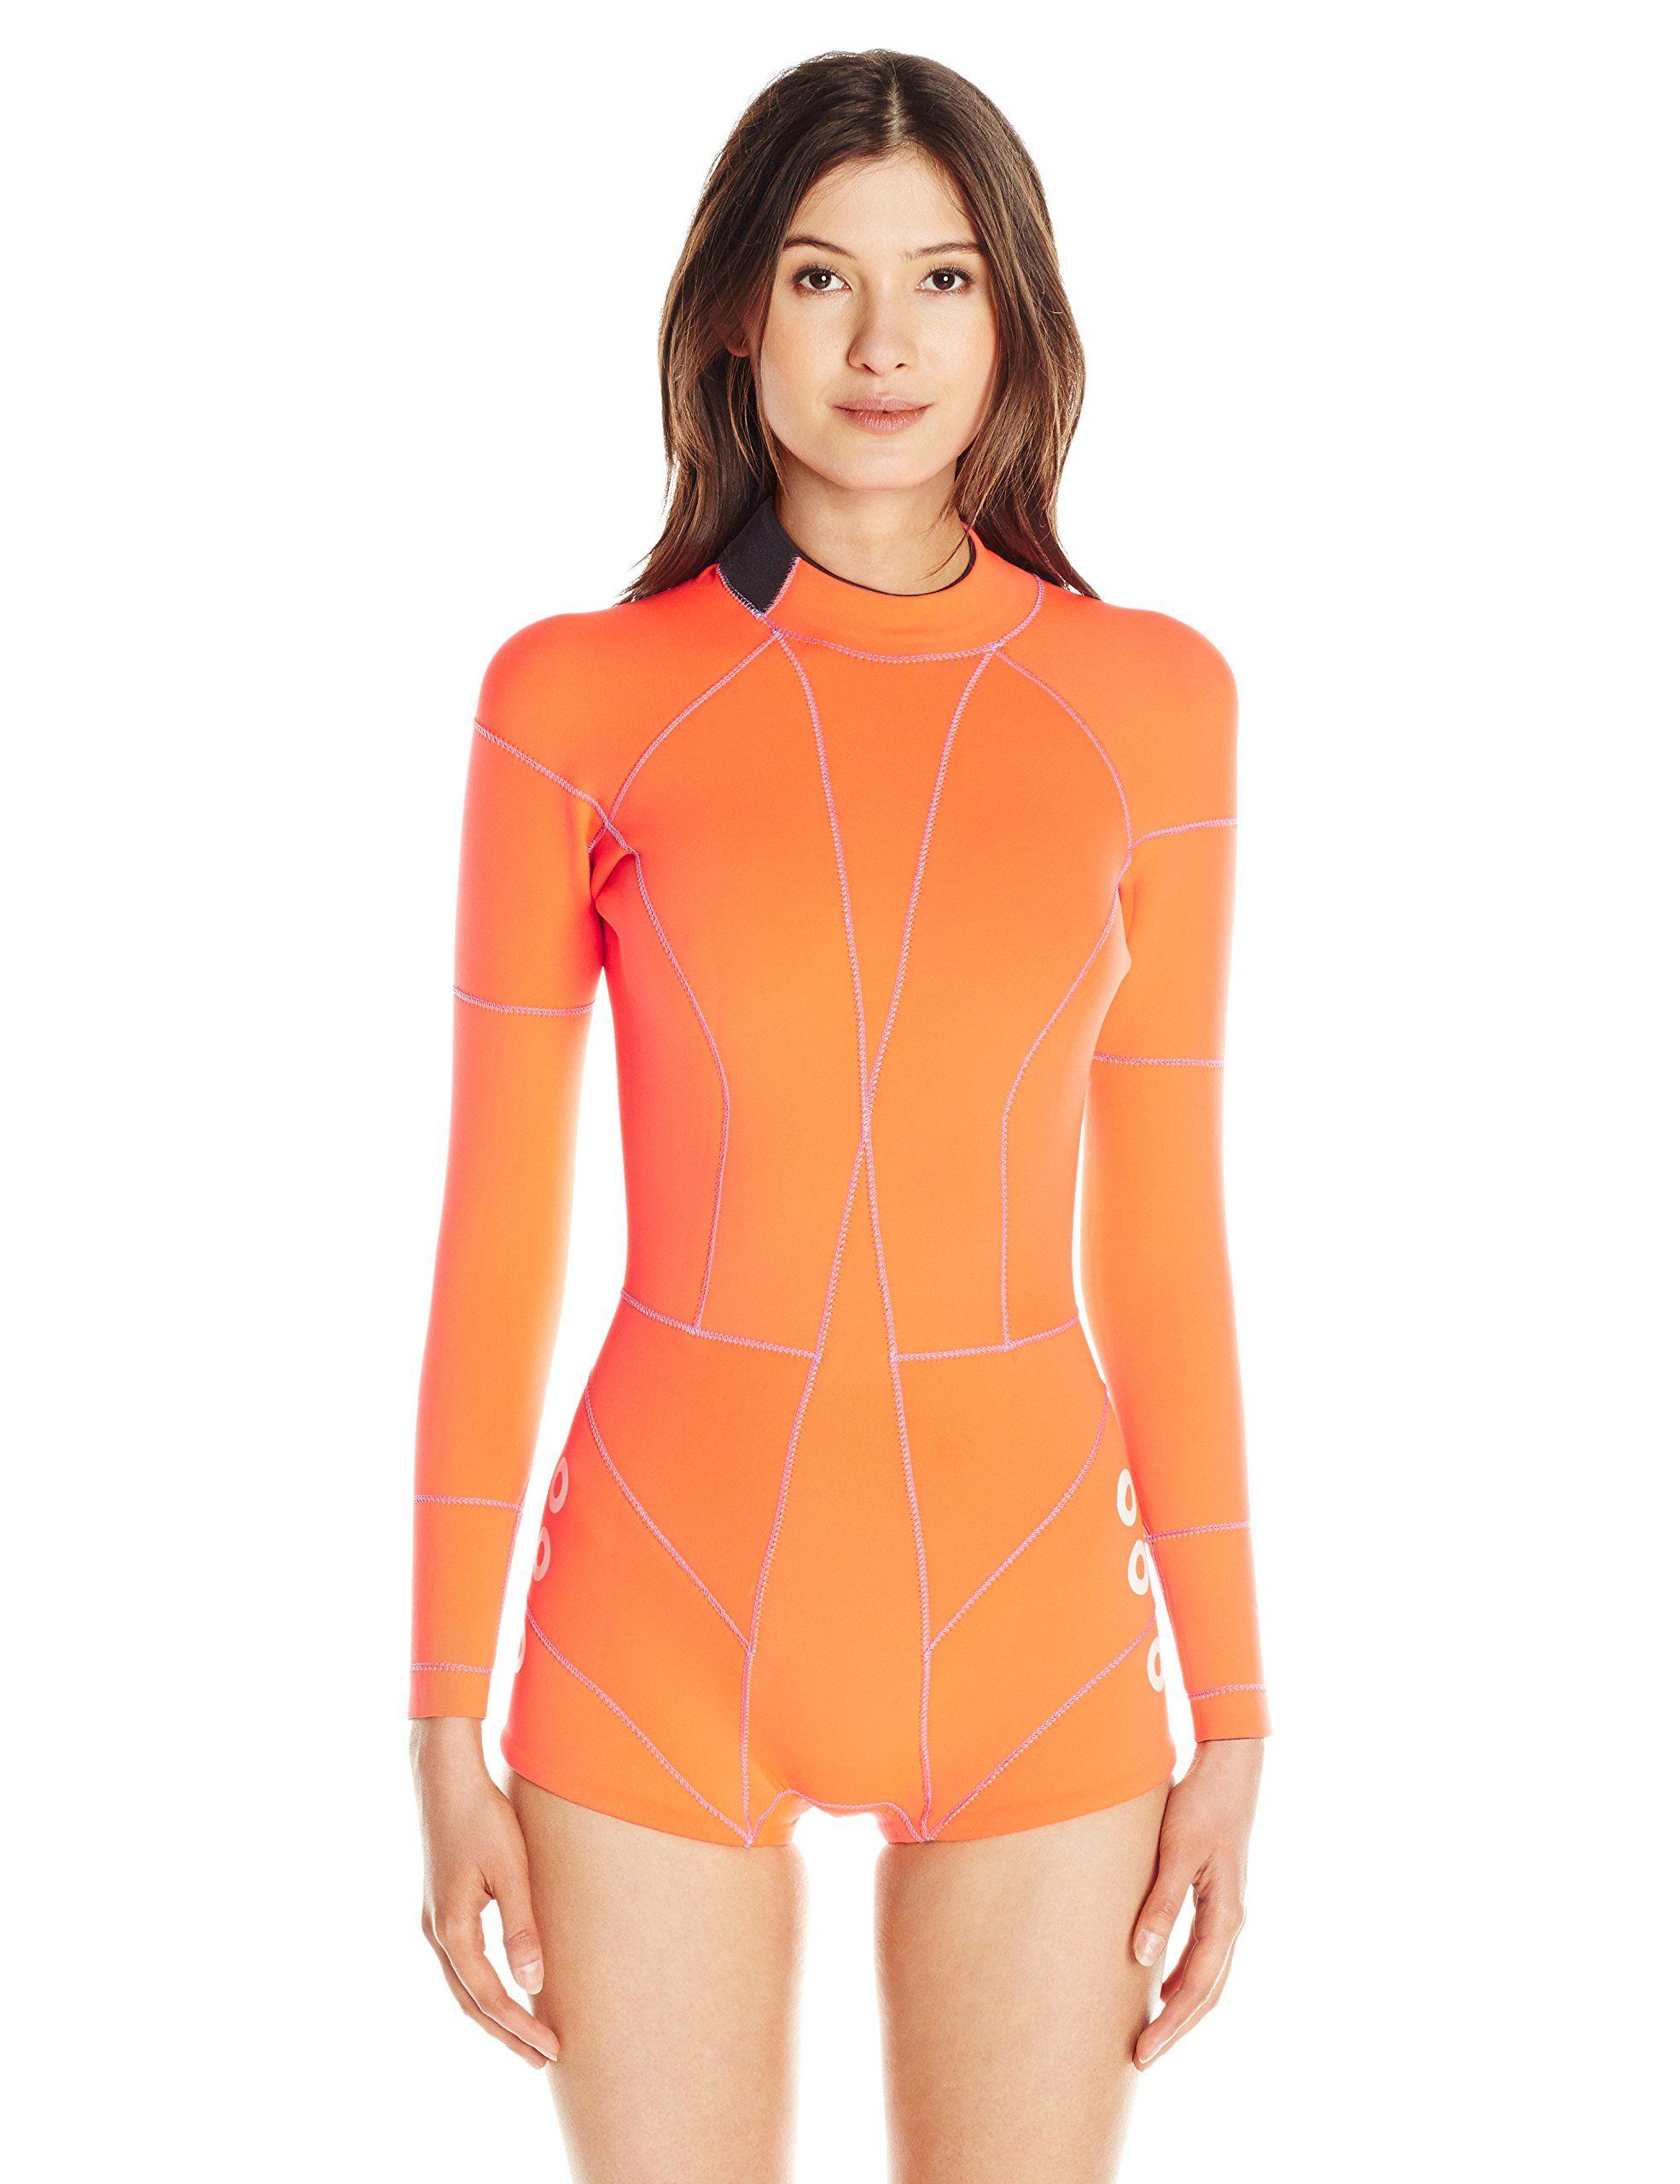 Cynthia Rowley Women s Fiber-Lite Wetsuit One Piece Swimsuit with Faux  Grommets f09d69139